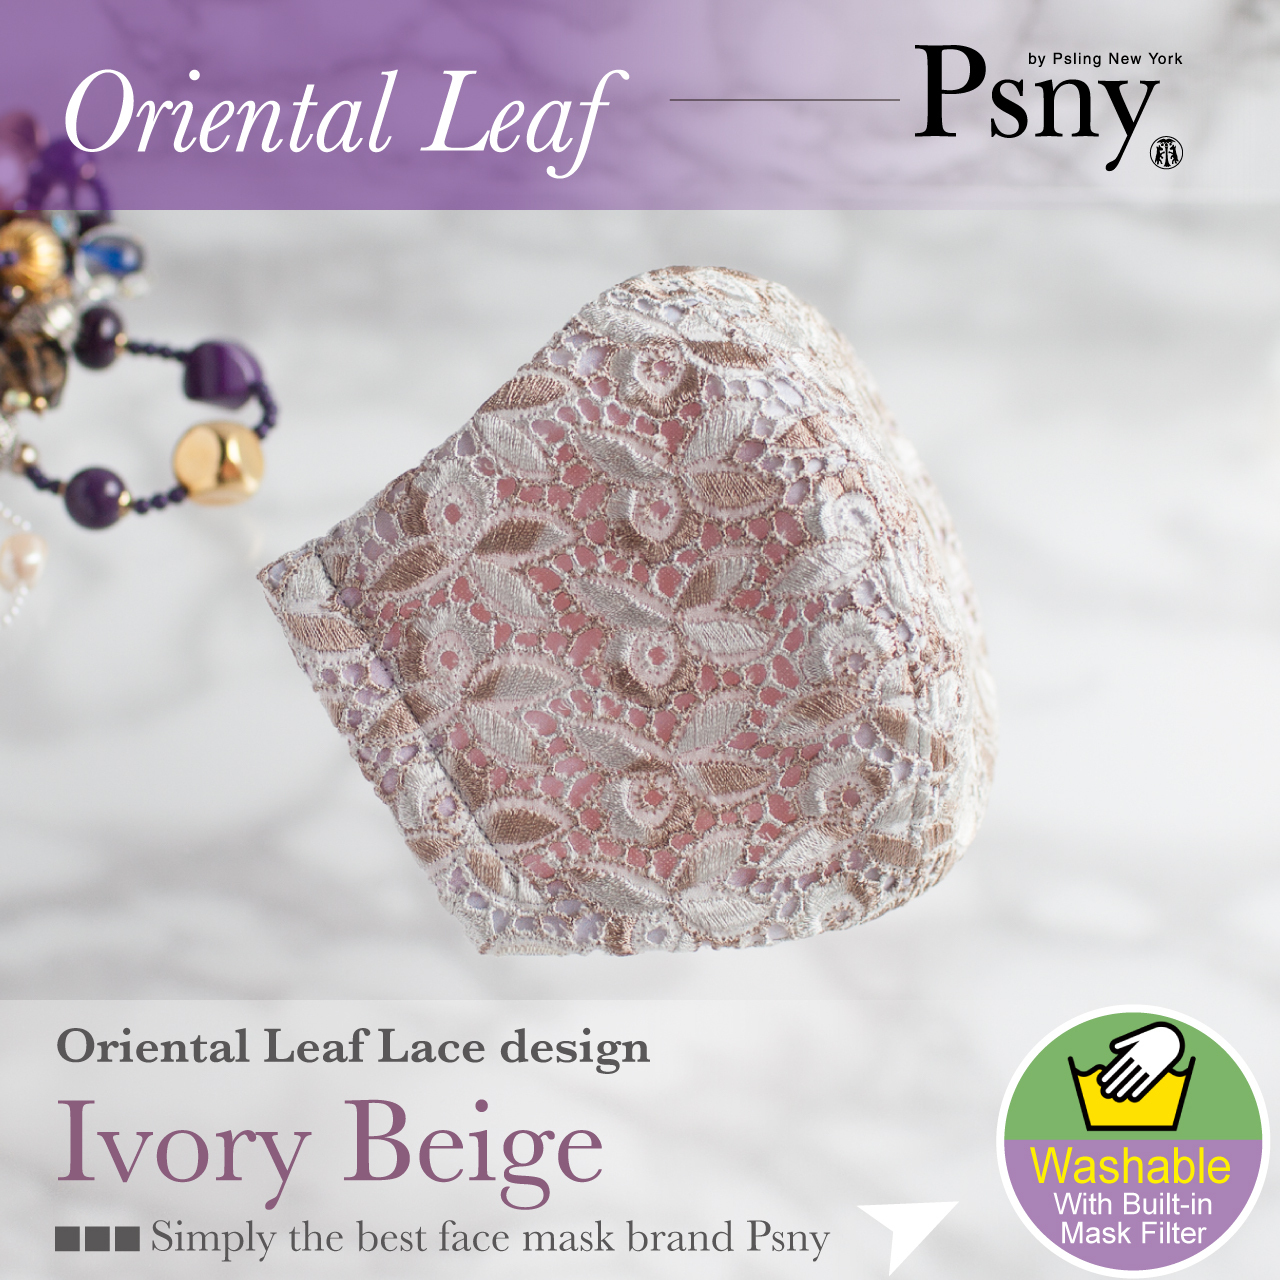 PSNY オリエンタルリーフ・アイボリー ベージュ レース 花粉 洗える不織布フィルター入り 立体 大人 おとな 高級 美人 マスク 送料無料 L78